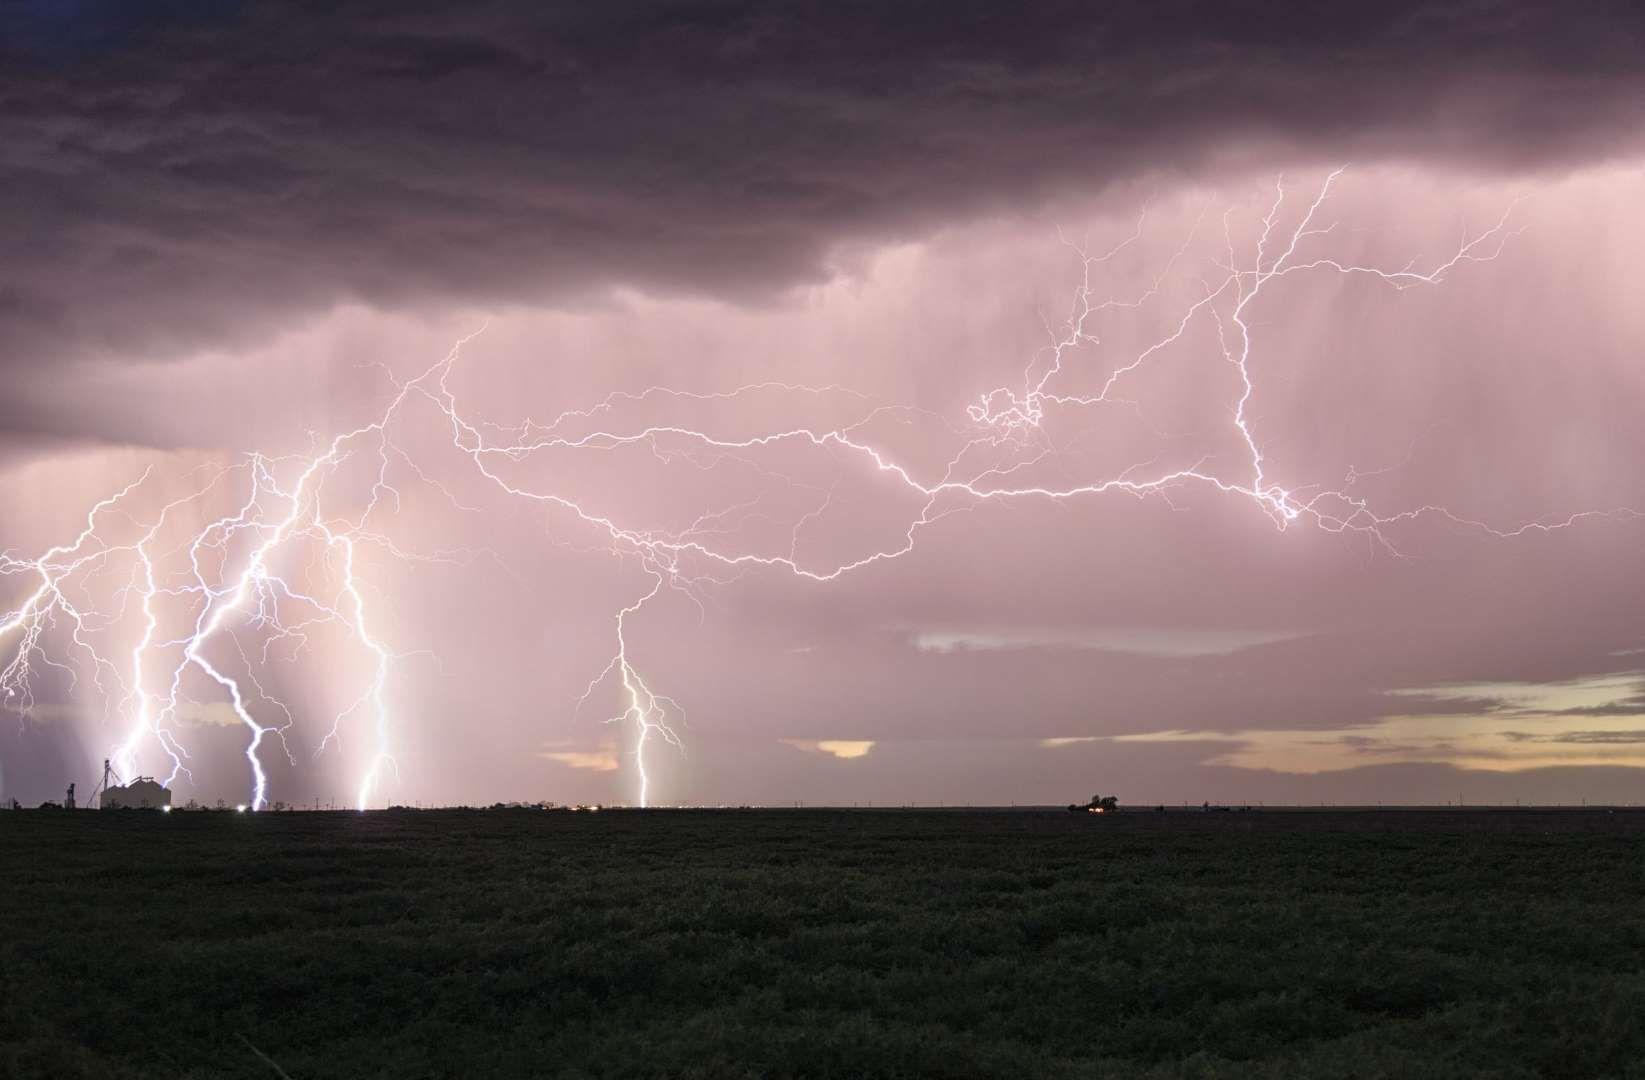 Lightning barrage near Dalhart, Texas - Marko Korosec/Solent News/REX